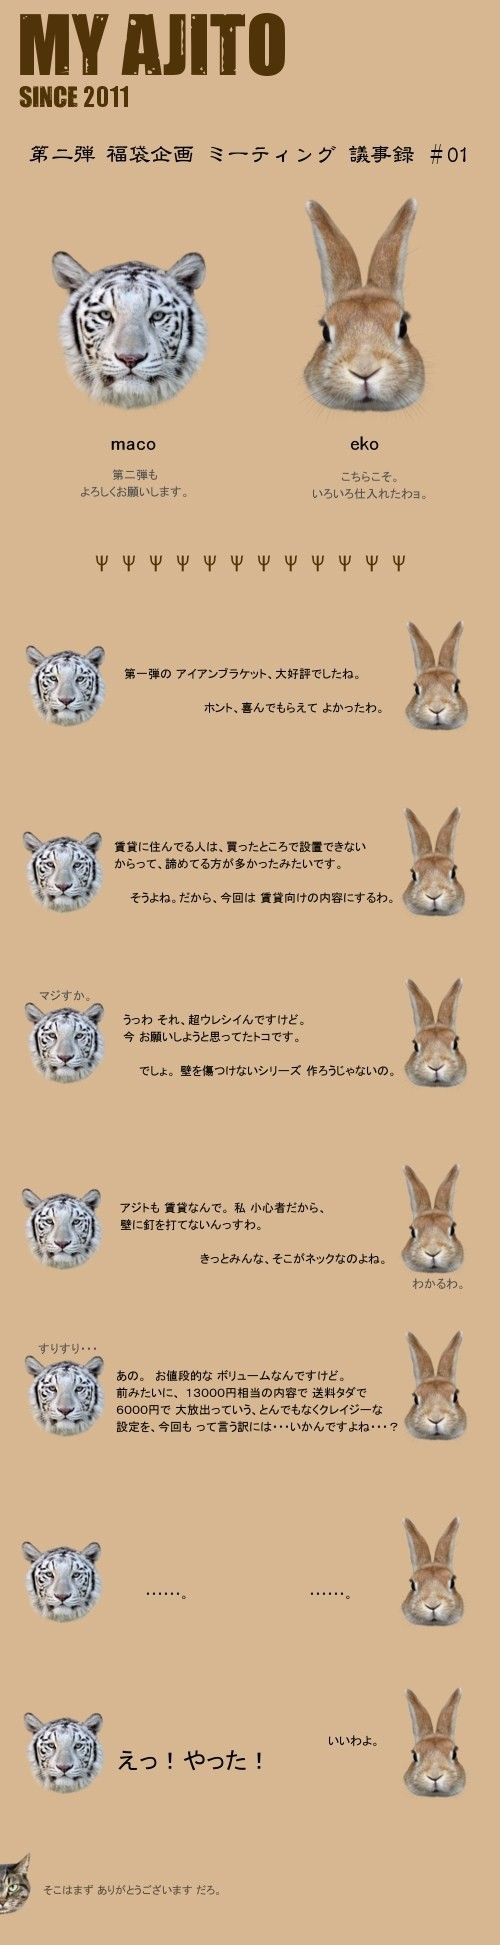 baki_2nd_2.jpg